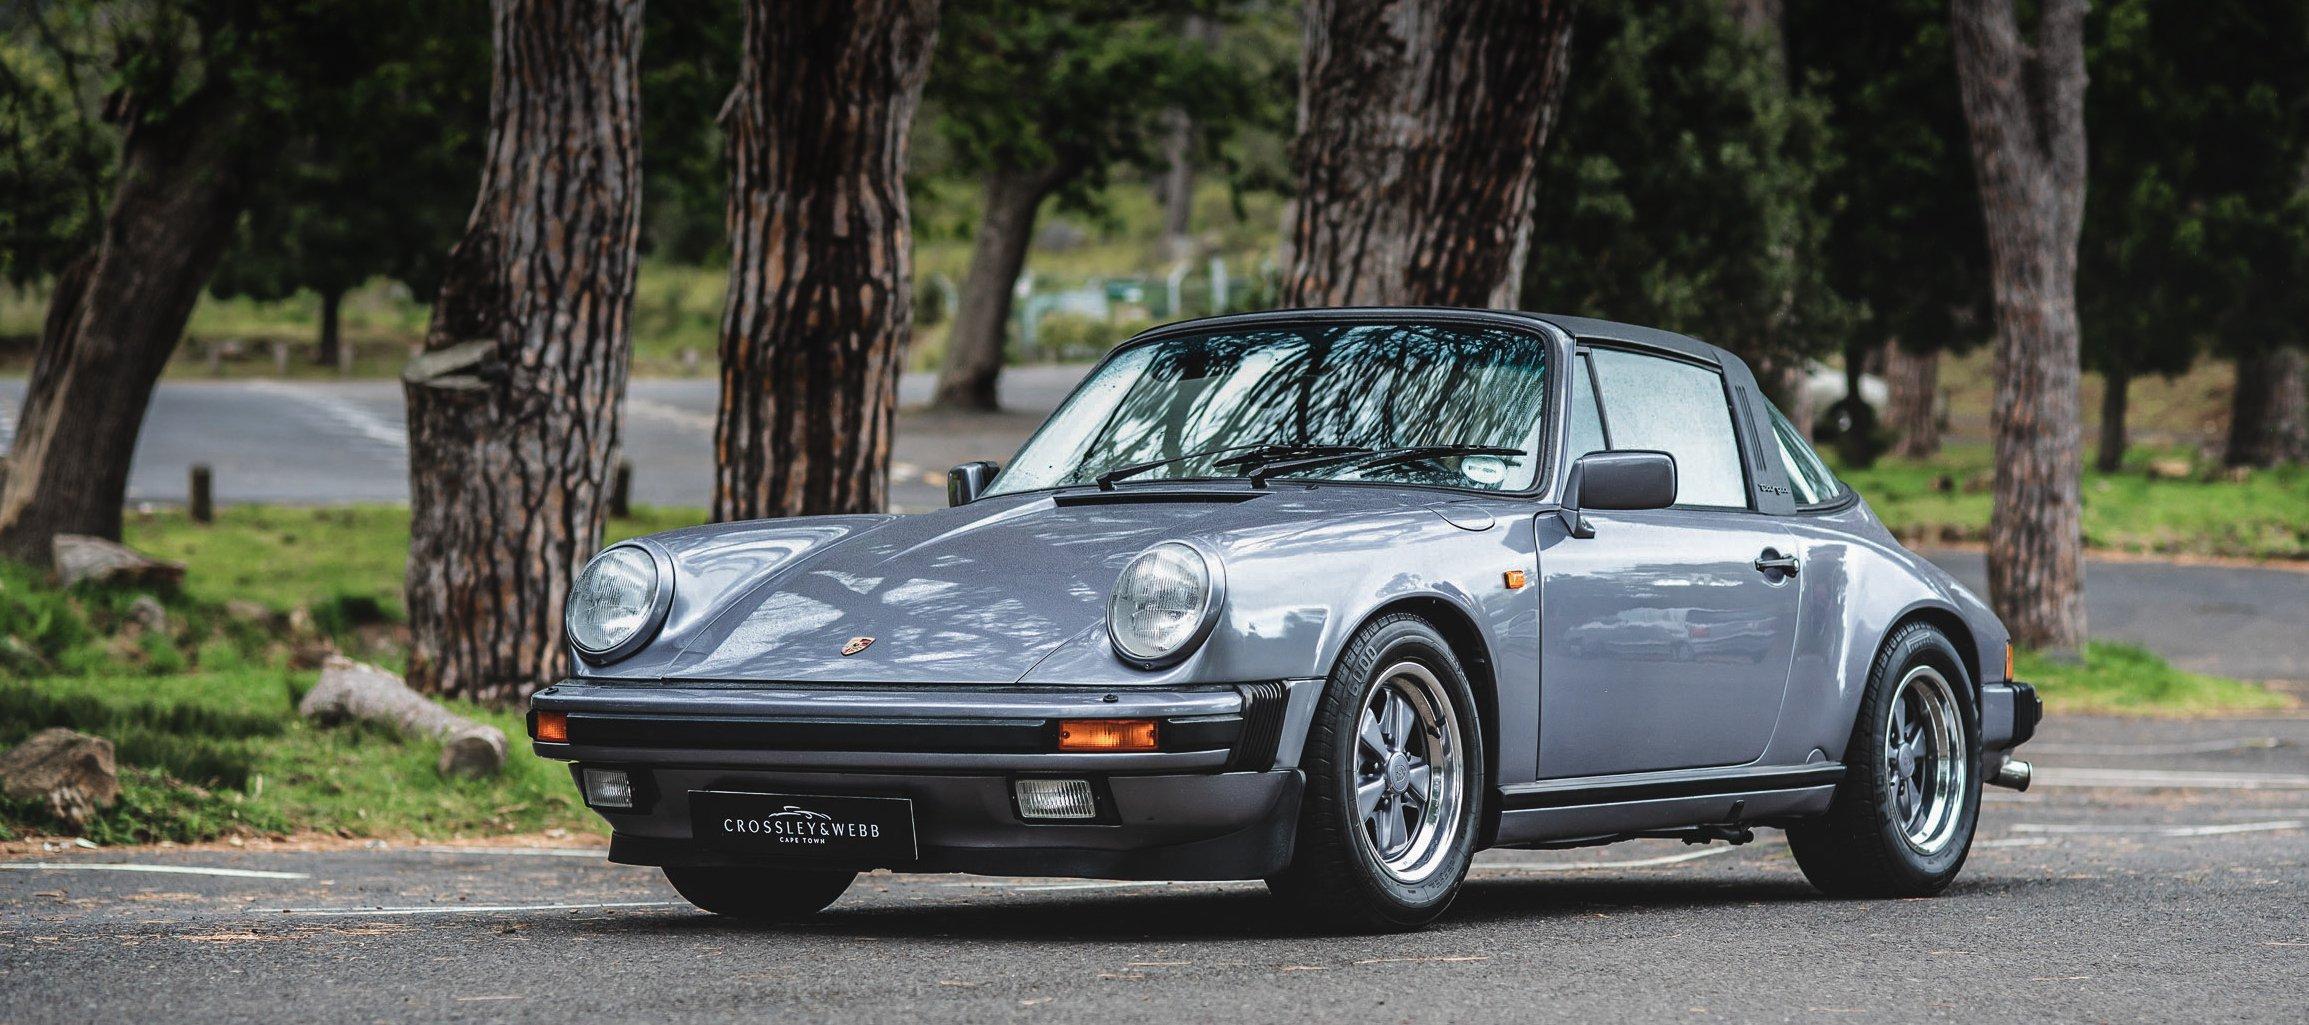 Porsche 911 Carrera - 16 - 9 (1 of 1).jpg